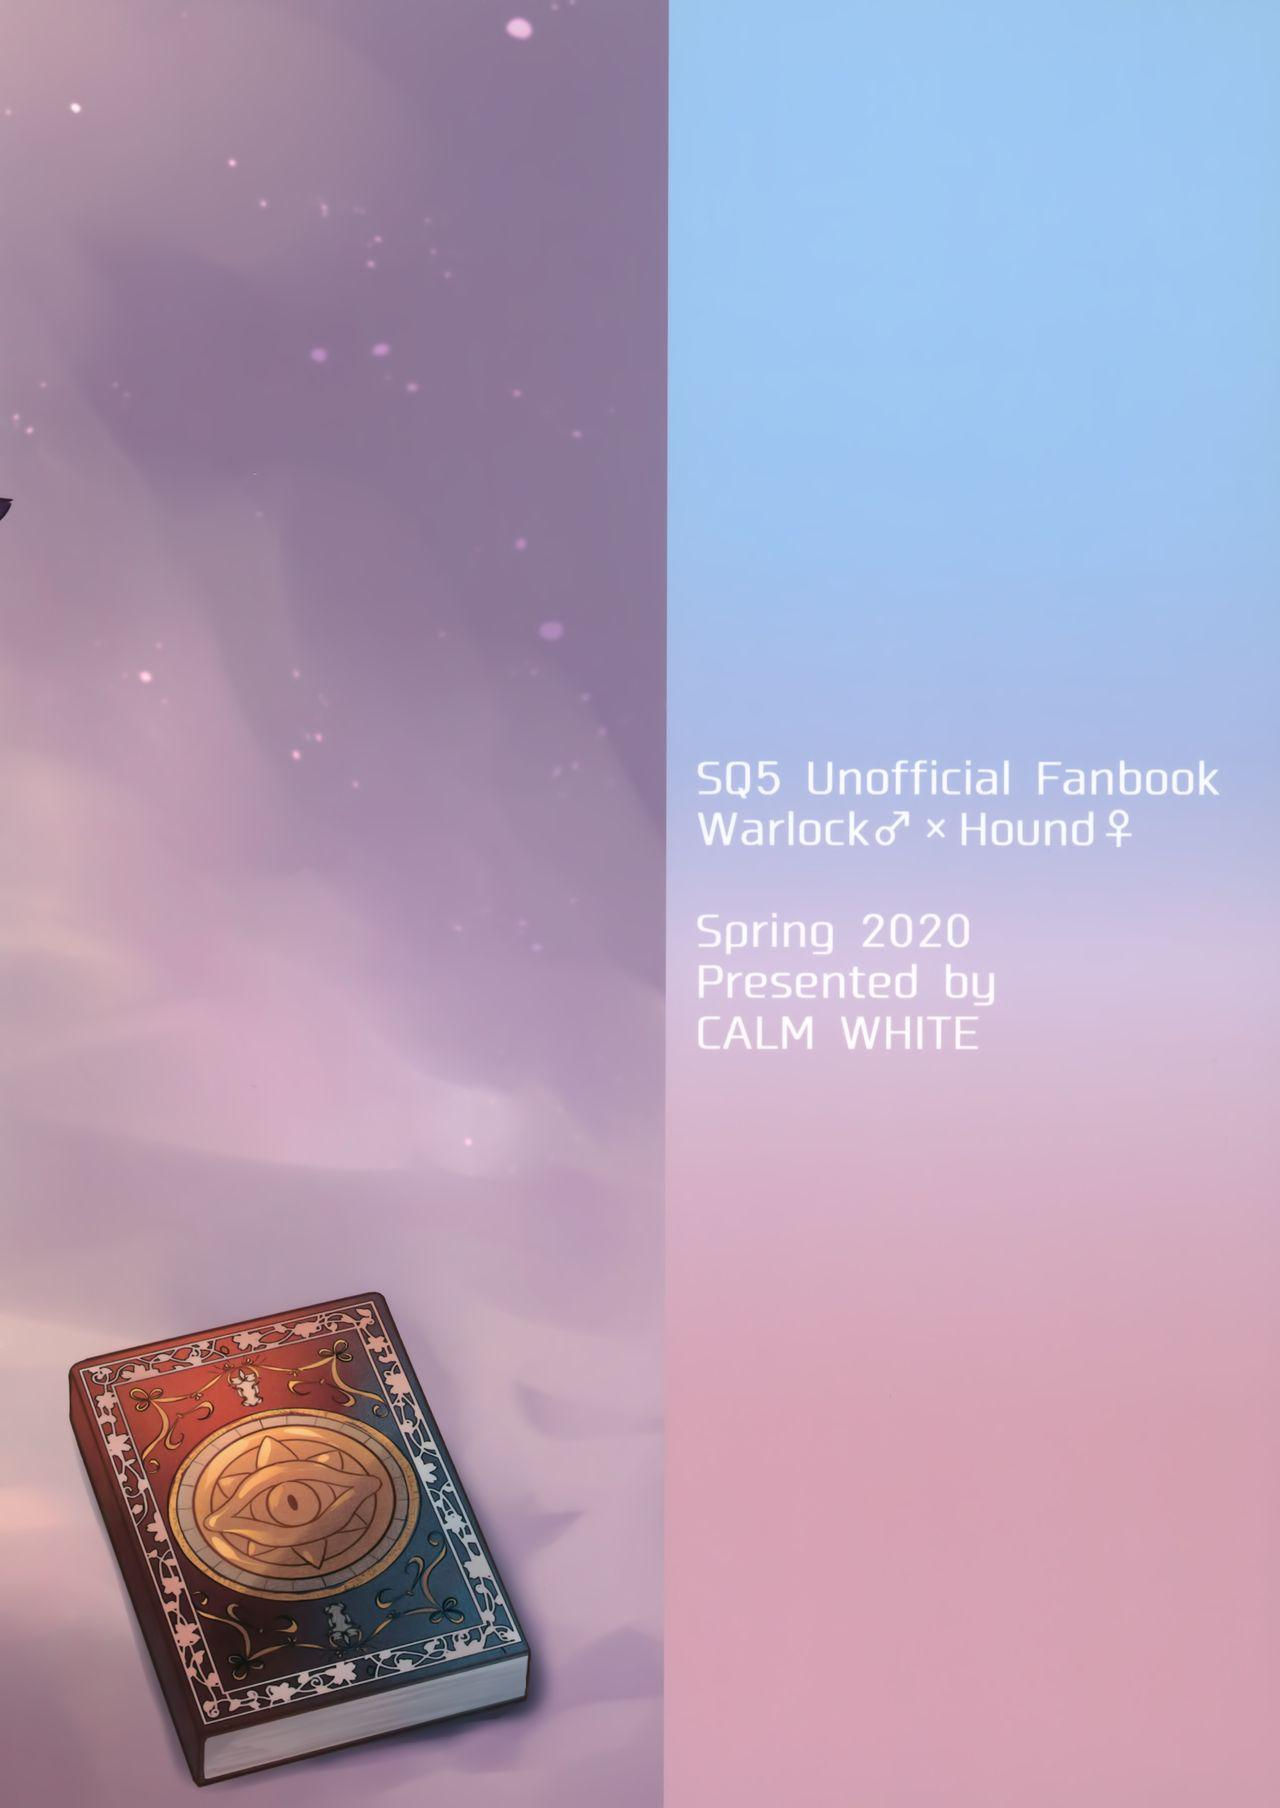 [Calm White (Mashiro Shirako)] Shirako)] Hound-chan Icha Love Saimin Sex | Lovey-Dovey Hypno Sex with Rover (Etrian Odyssey) [English] [incogna777] 25